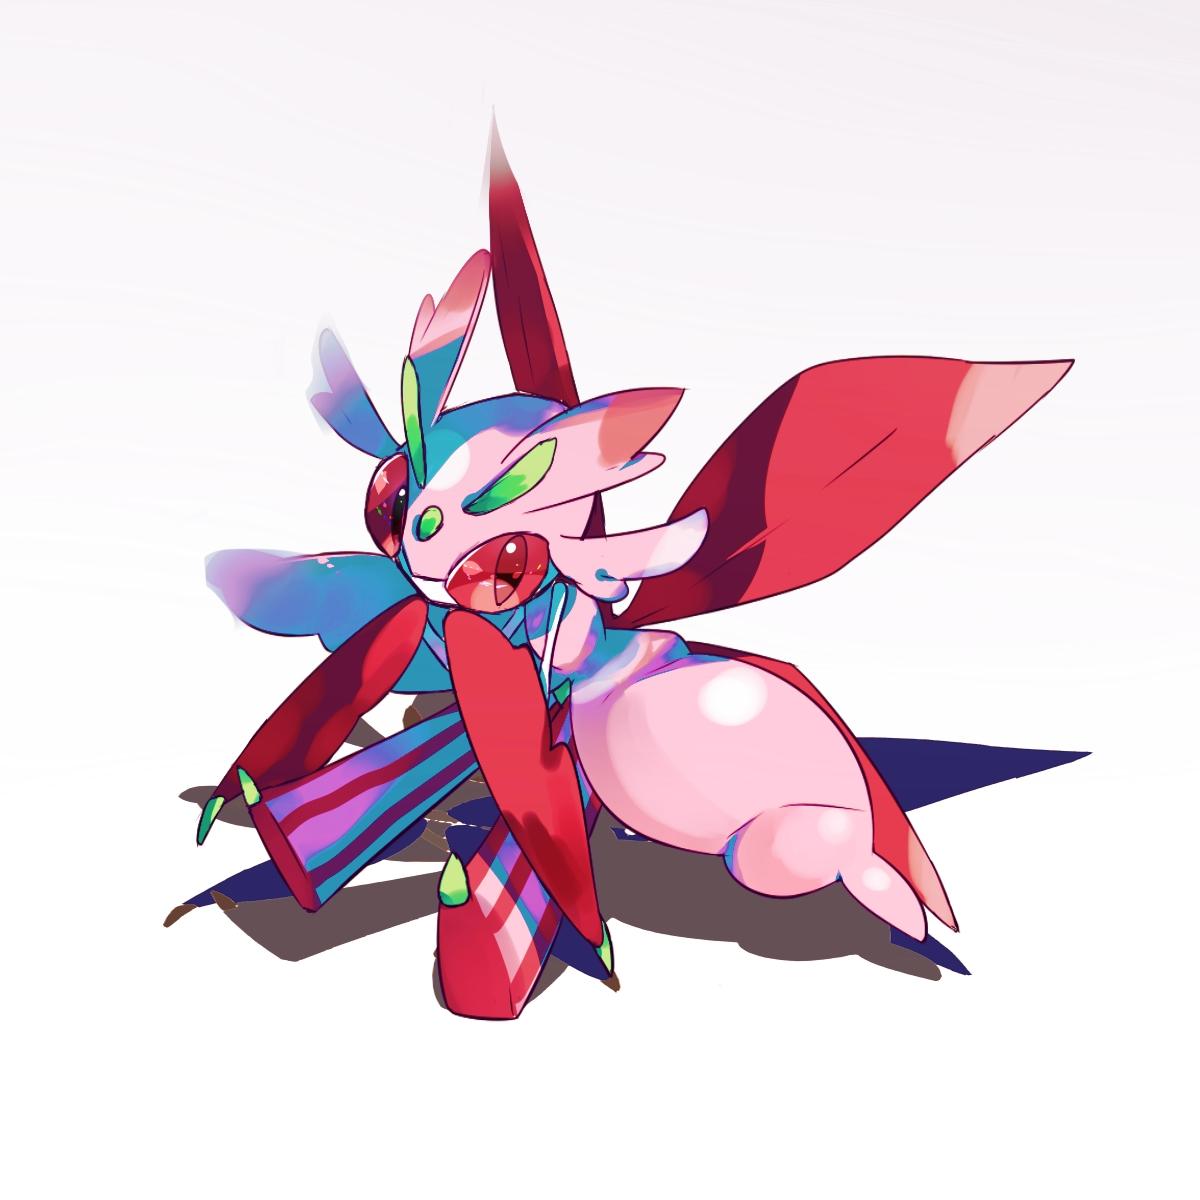 Lurantis - Pokémon - Image #2025445 - Zerochan Anime Image